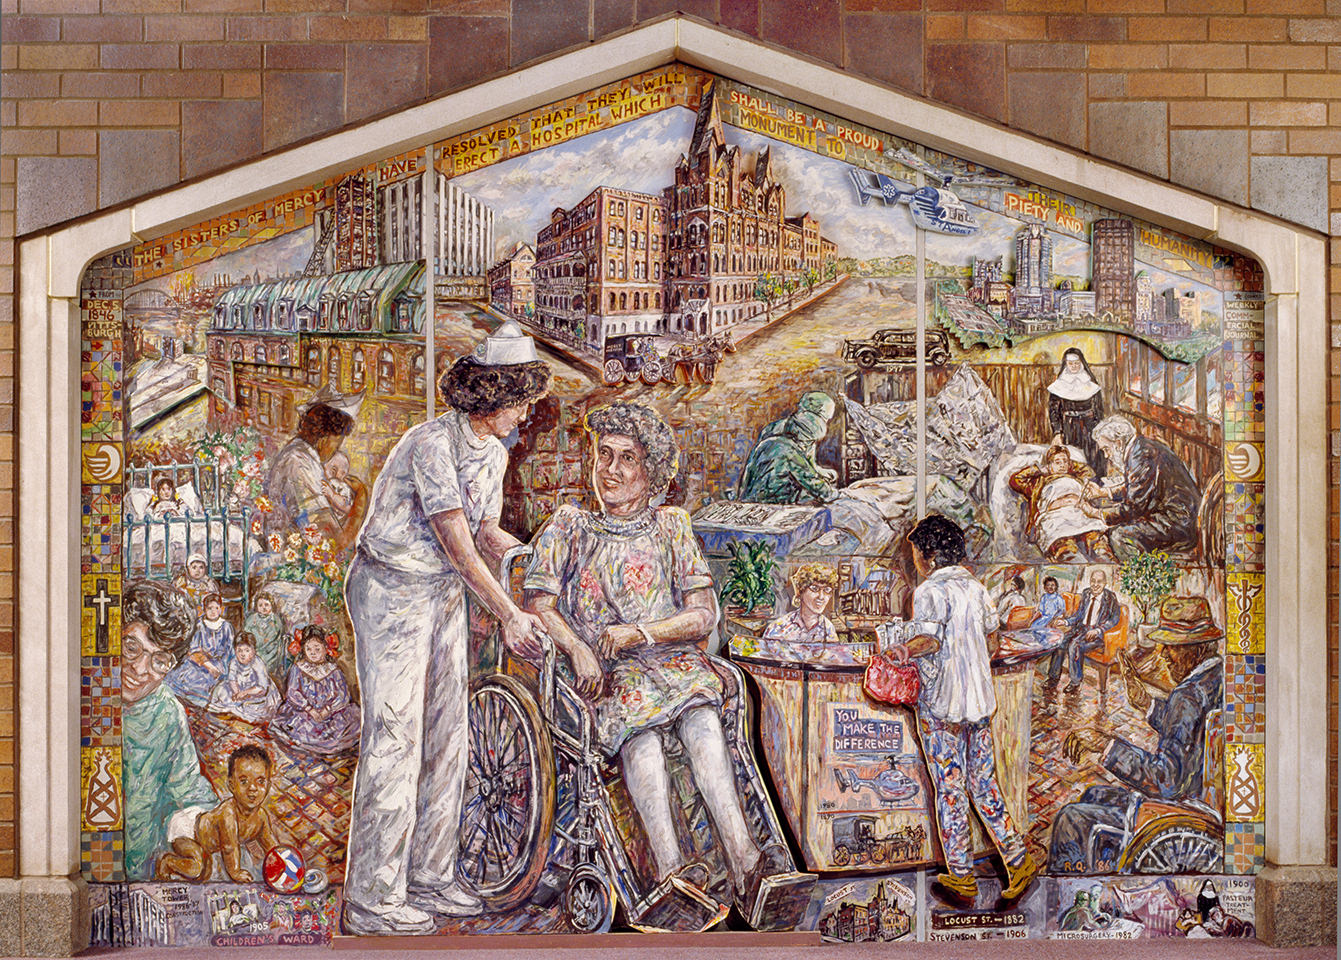 Mercy Hospital Mural